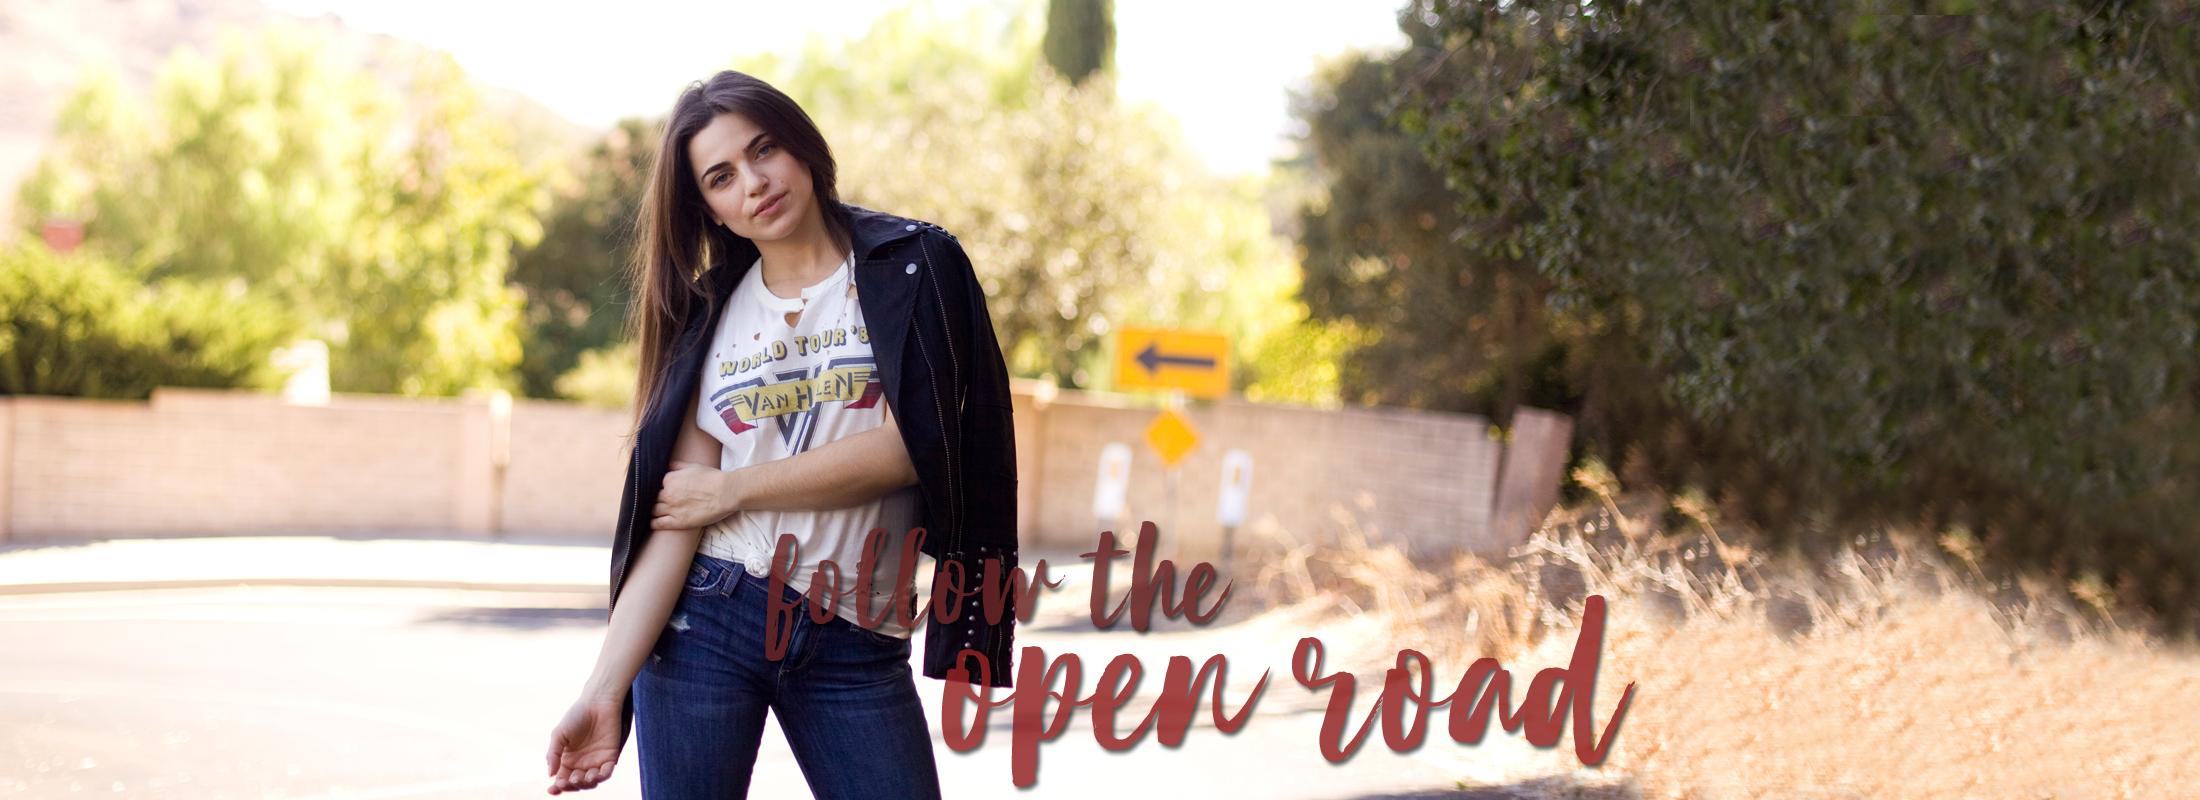 follow the open road